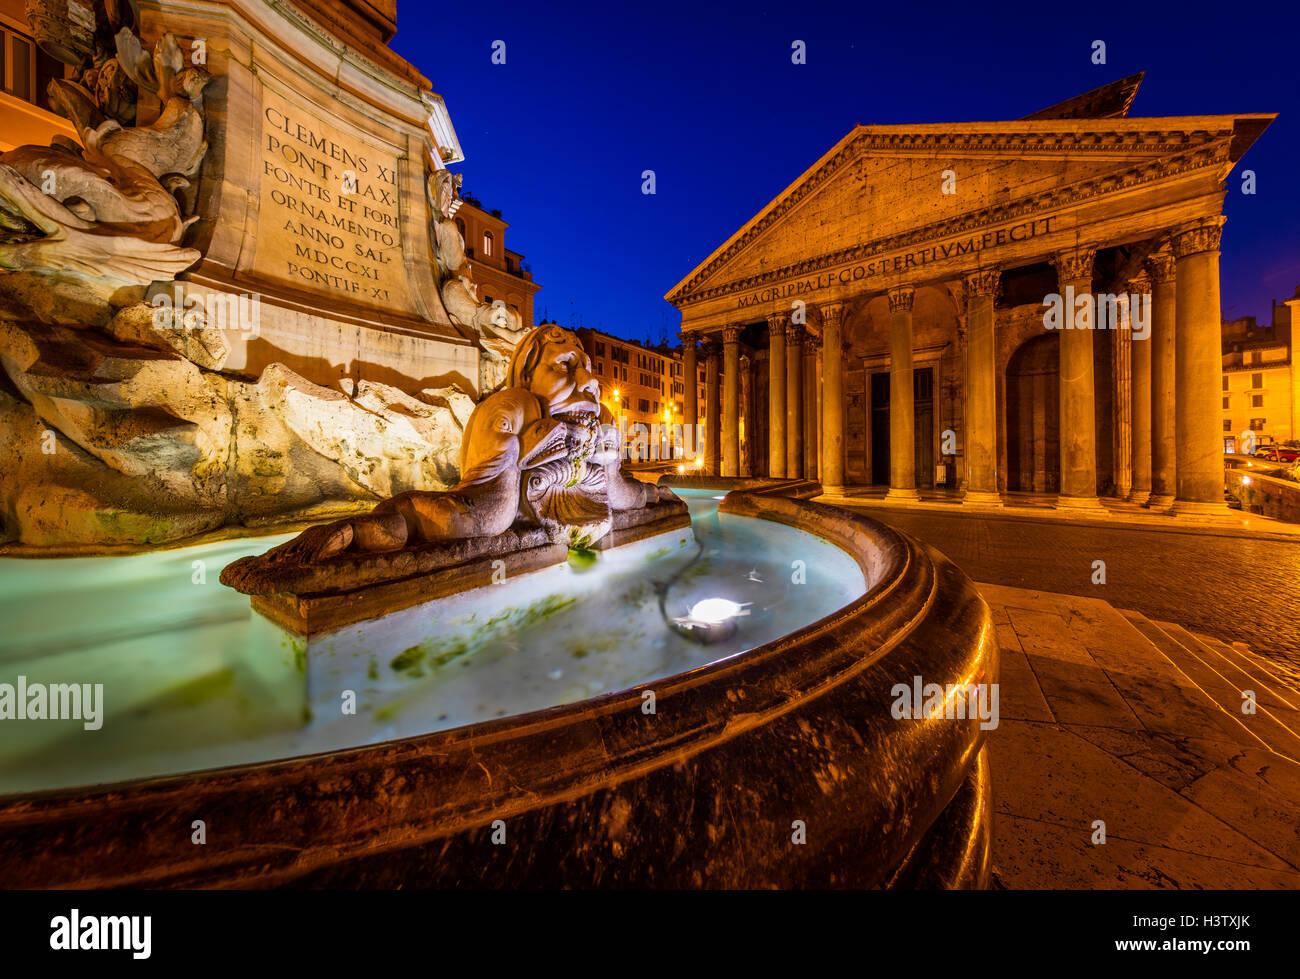 La Fontana del Pantheon fontana di fronte al Pantheon di Roma, Italia. Immagini Stock